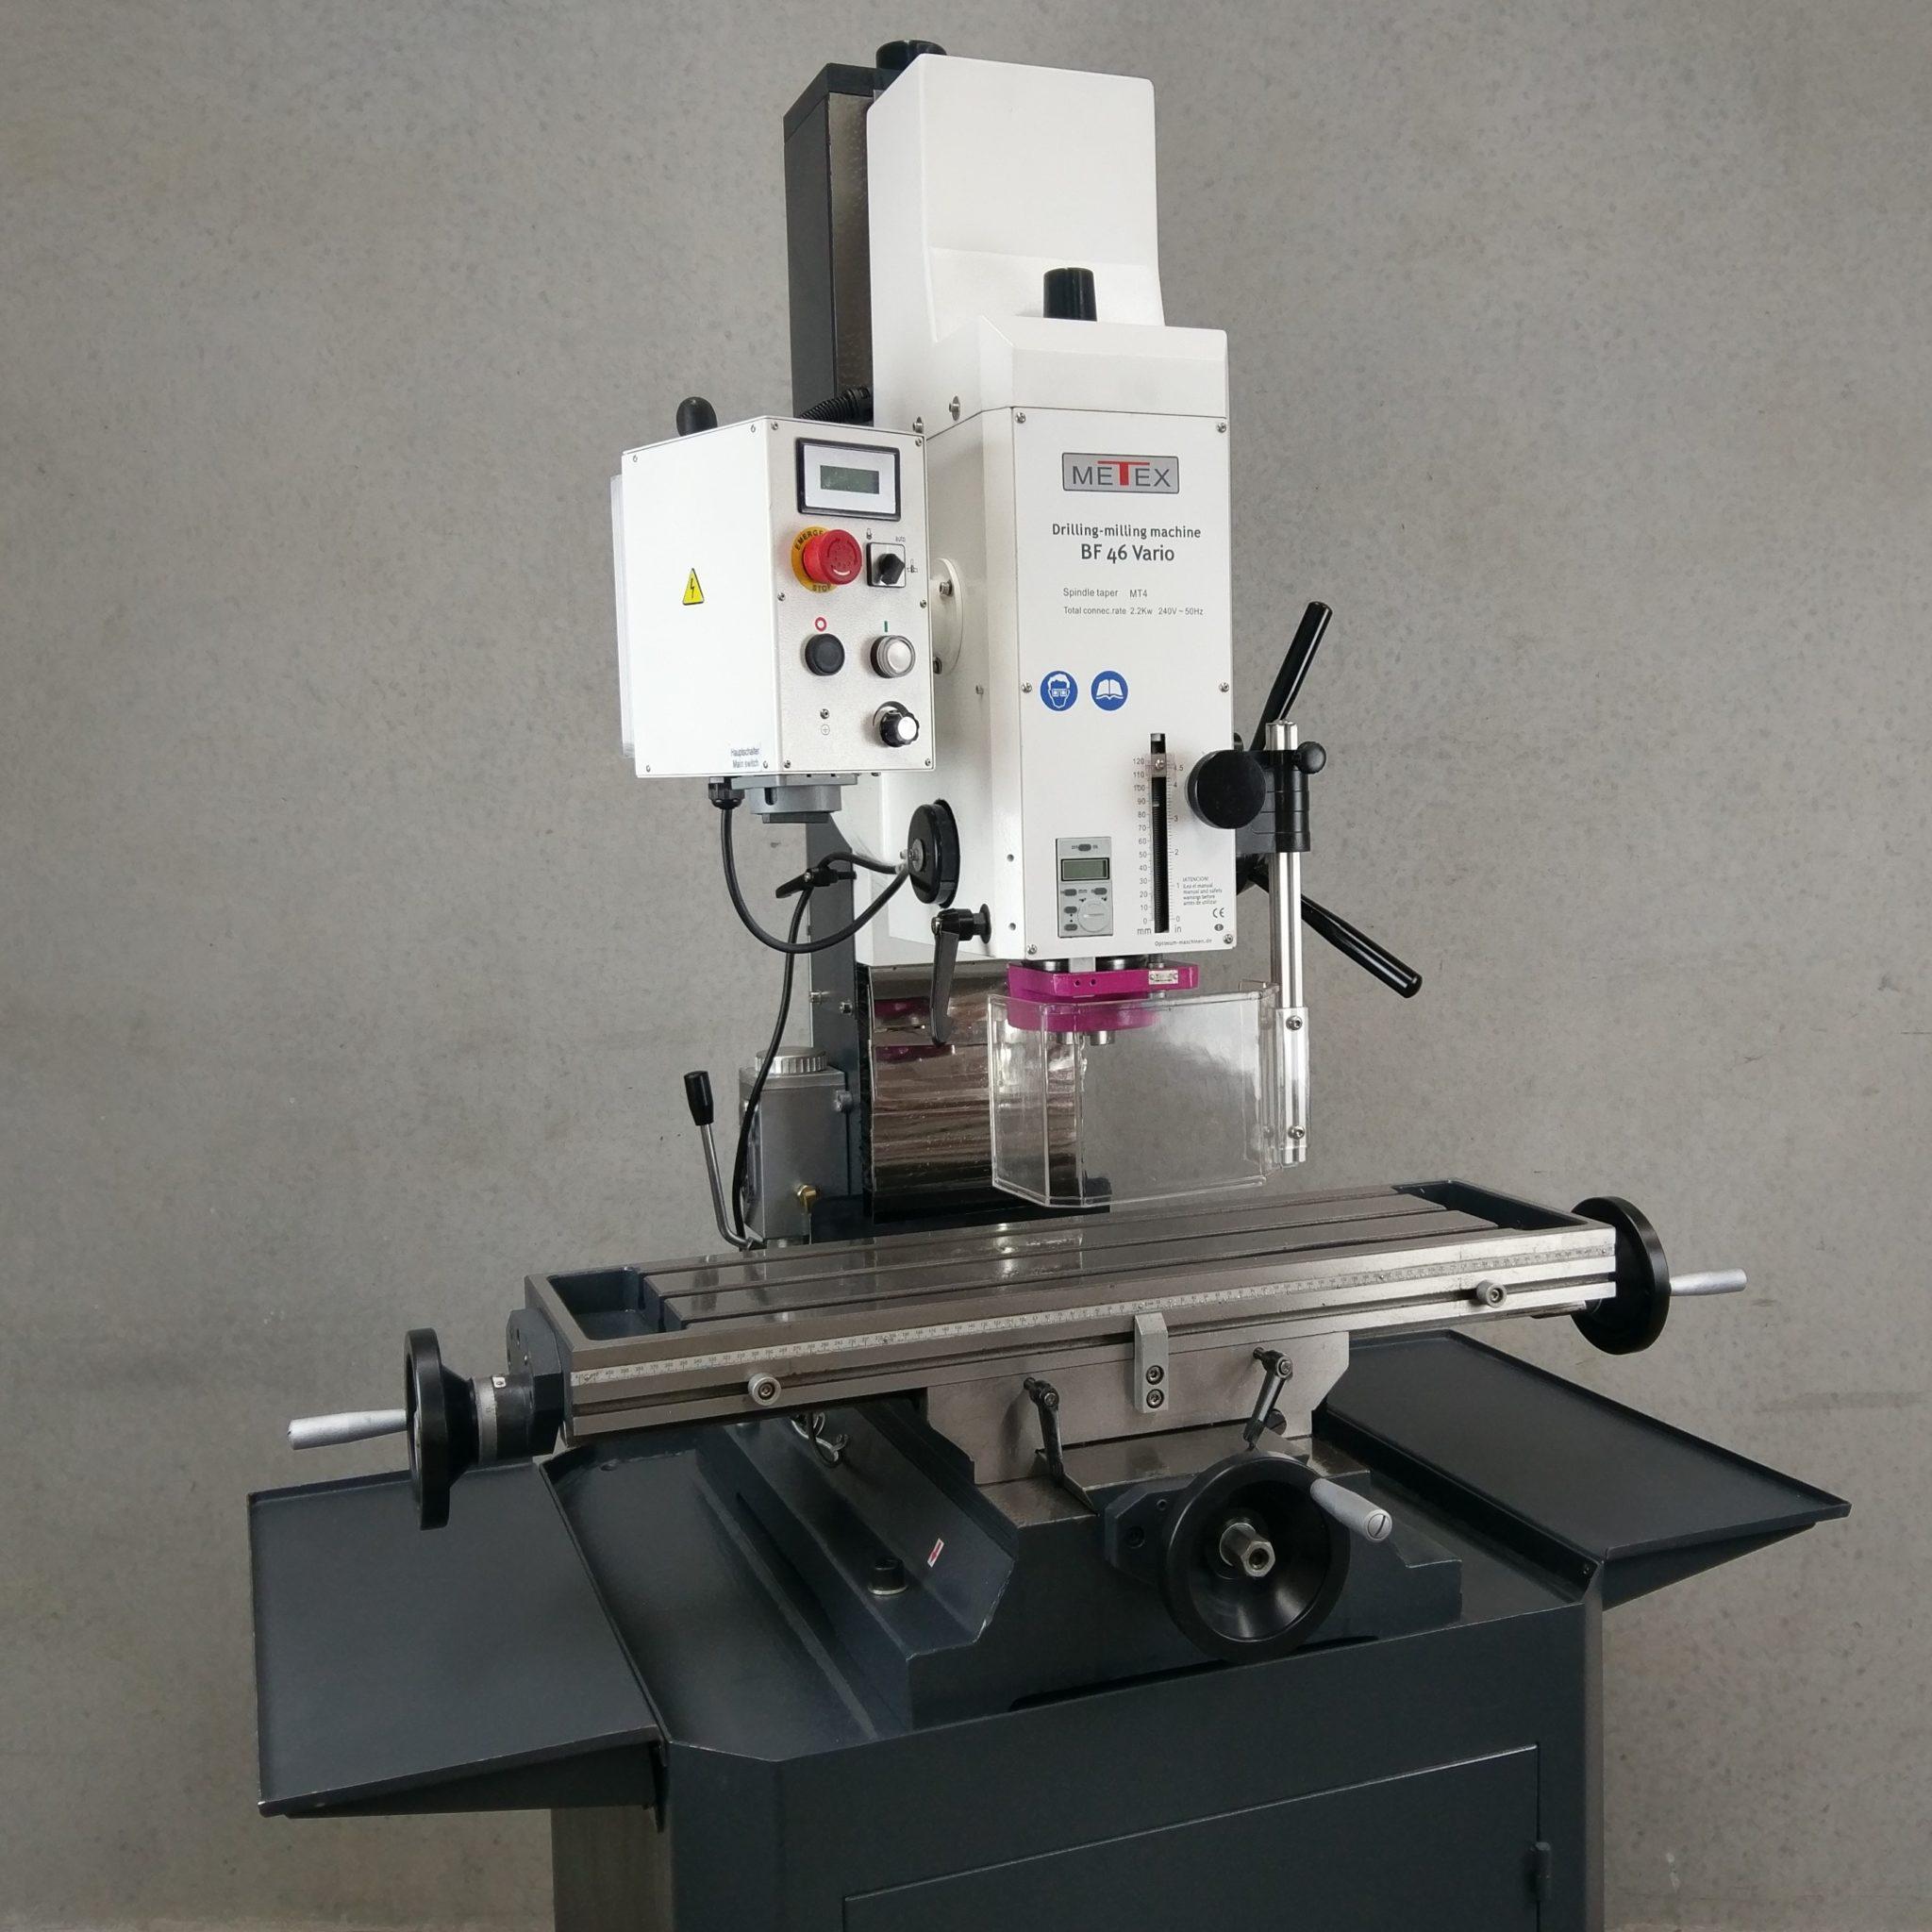 Metex Opti Bf46v Milling Machine Redfoxmachinery